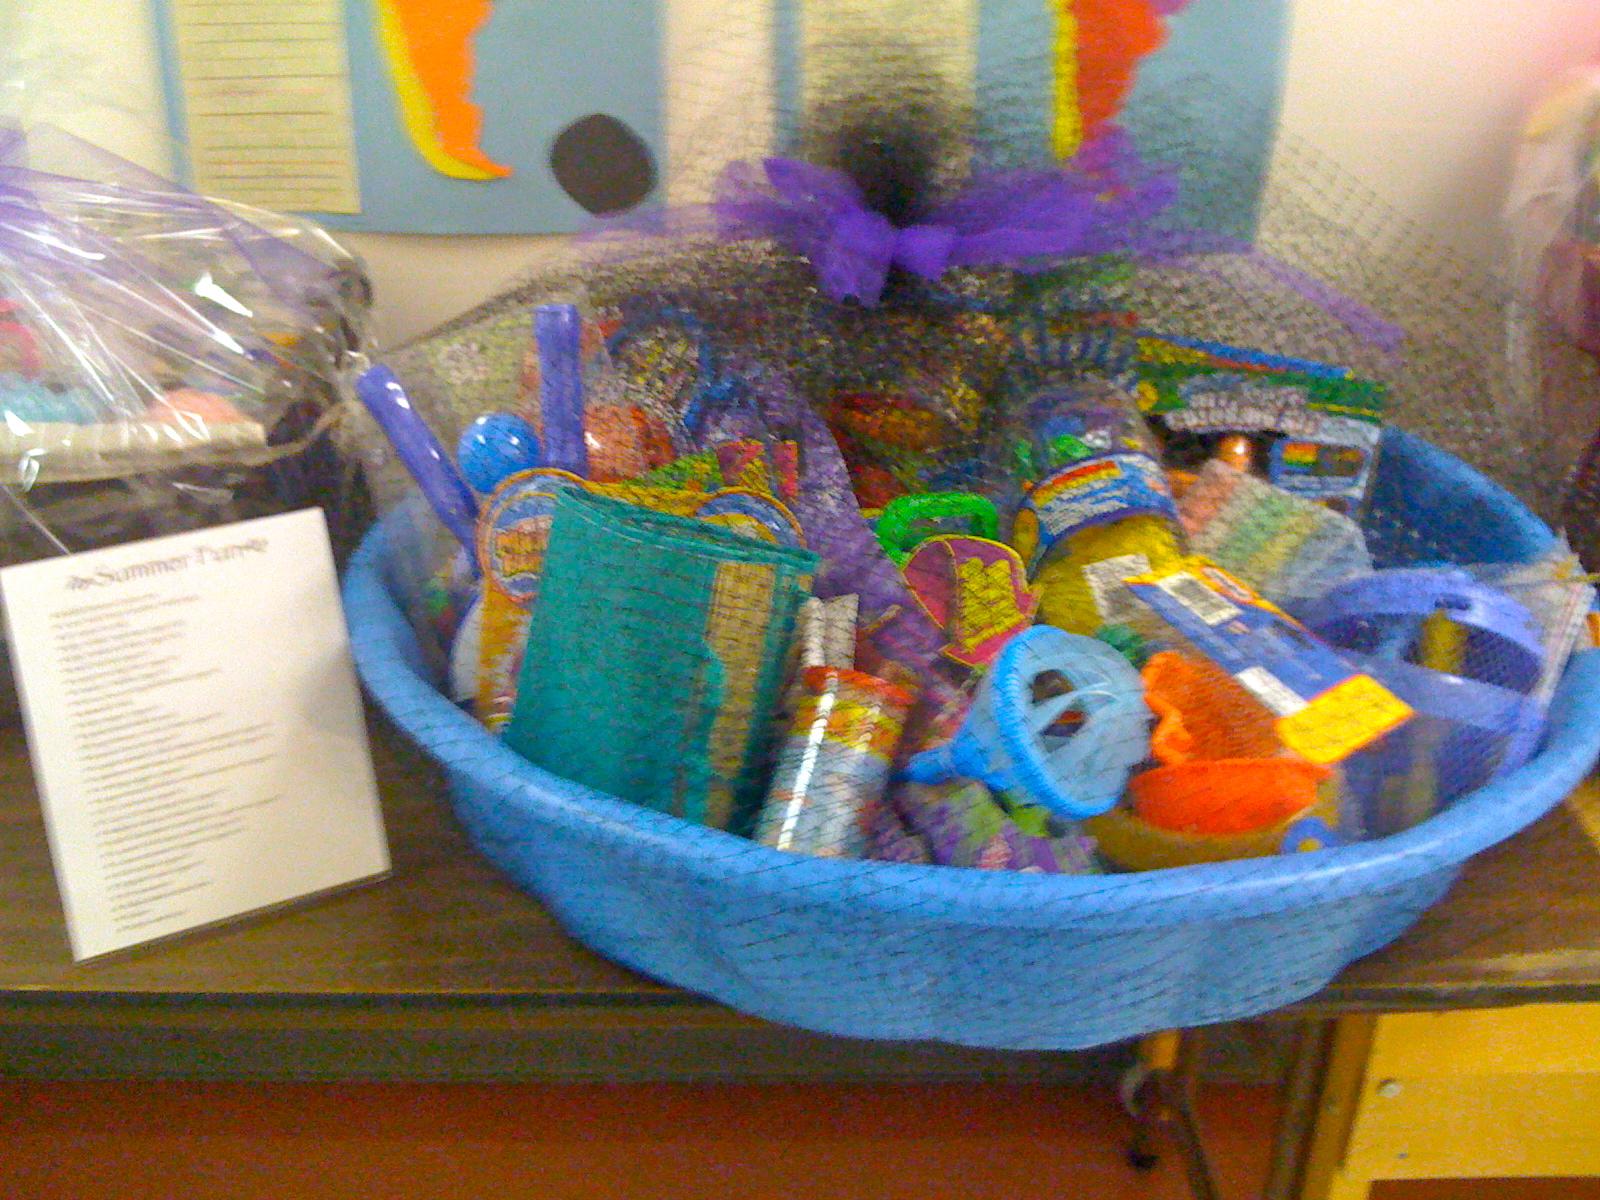 Toy Raffle Prizes : Spring picnic new school montessori center